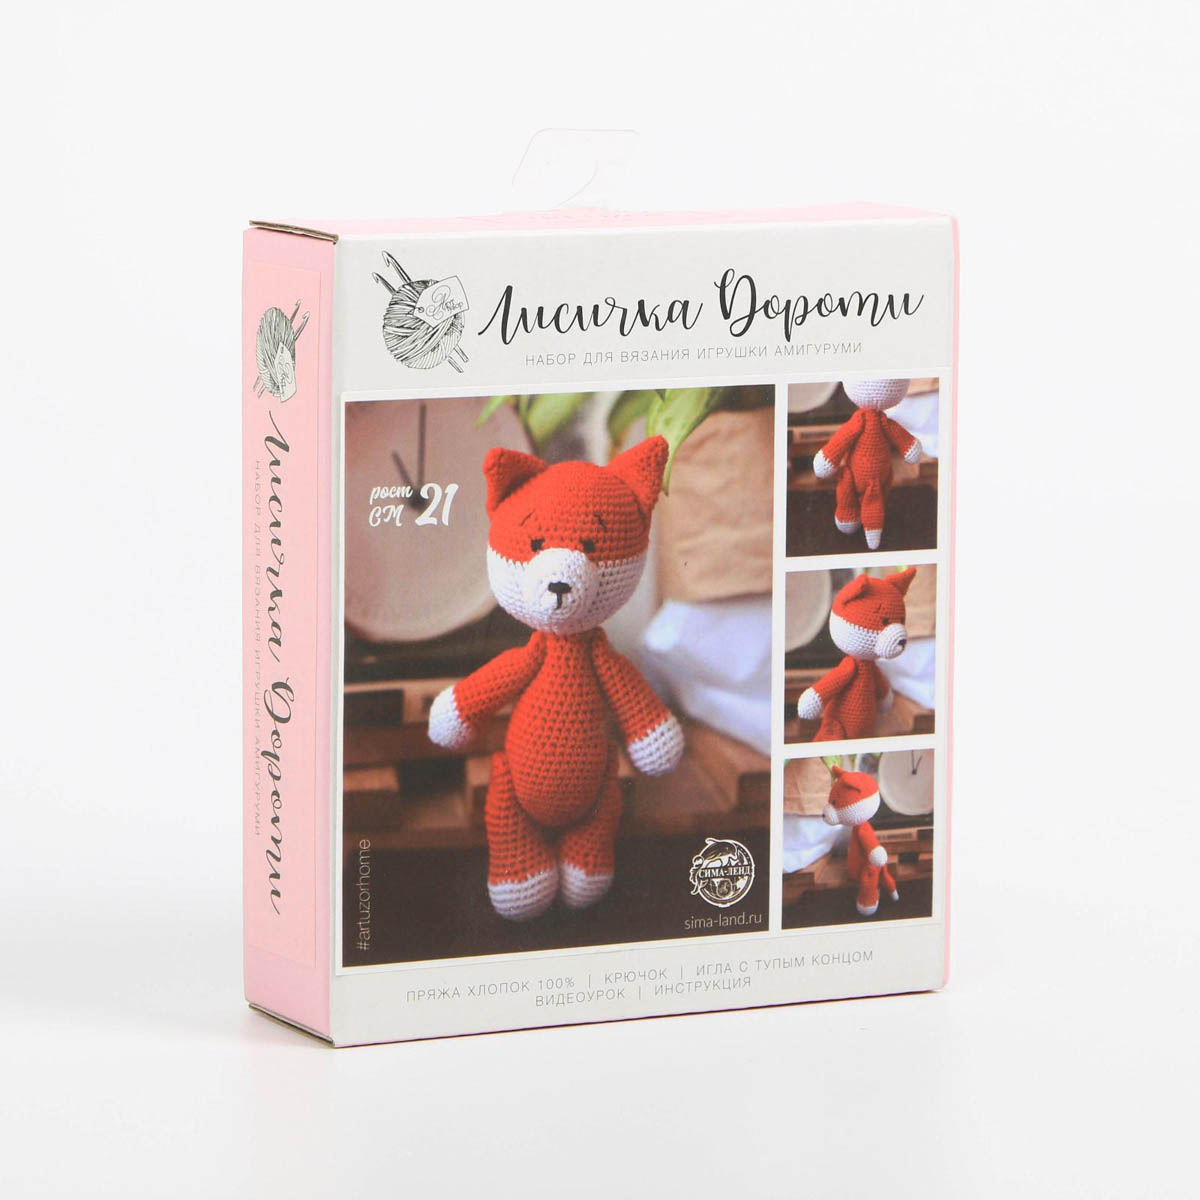 2724099 Амигуруми: Мягкая игрушка 'Лисичка Дороти', набор для вязания, 10*4* 14 см